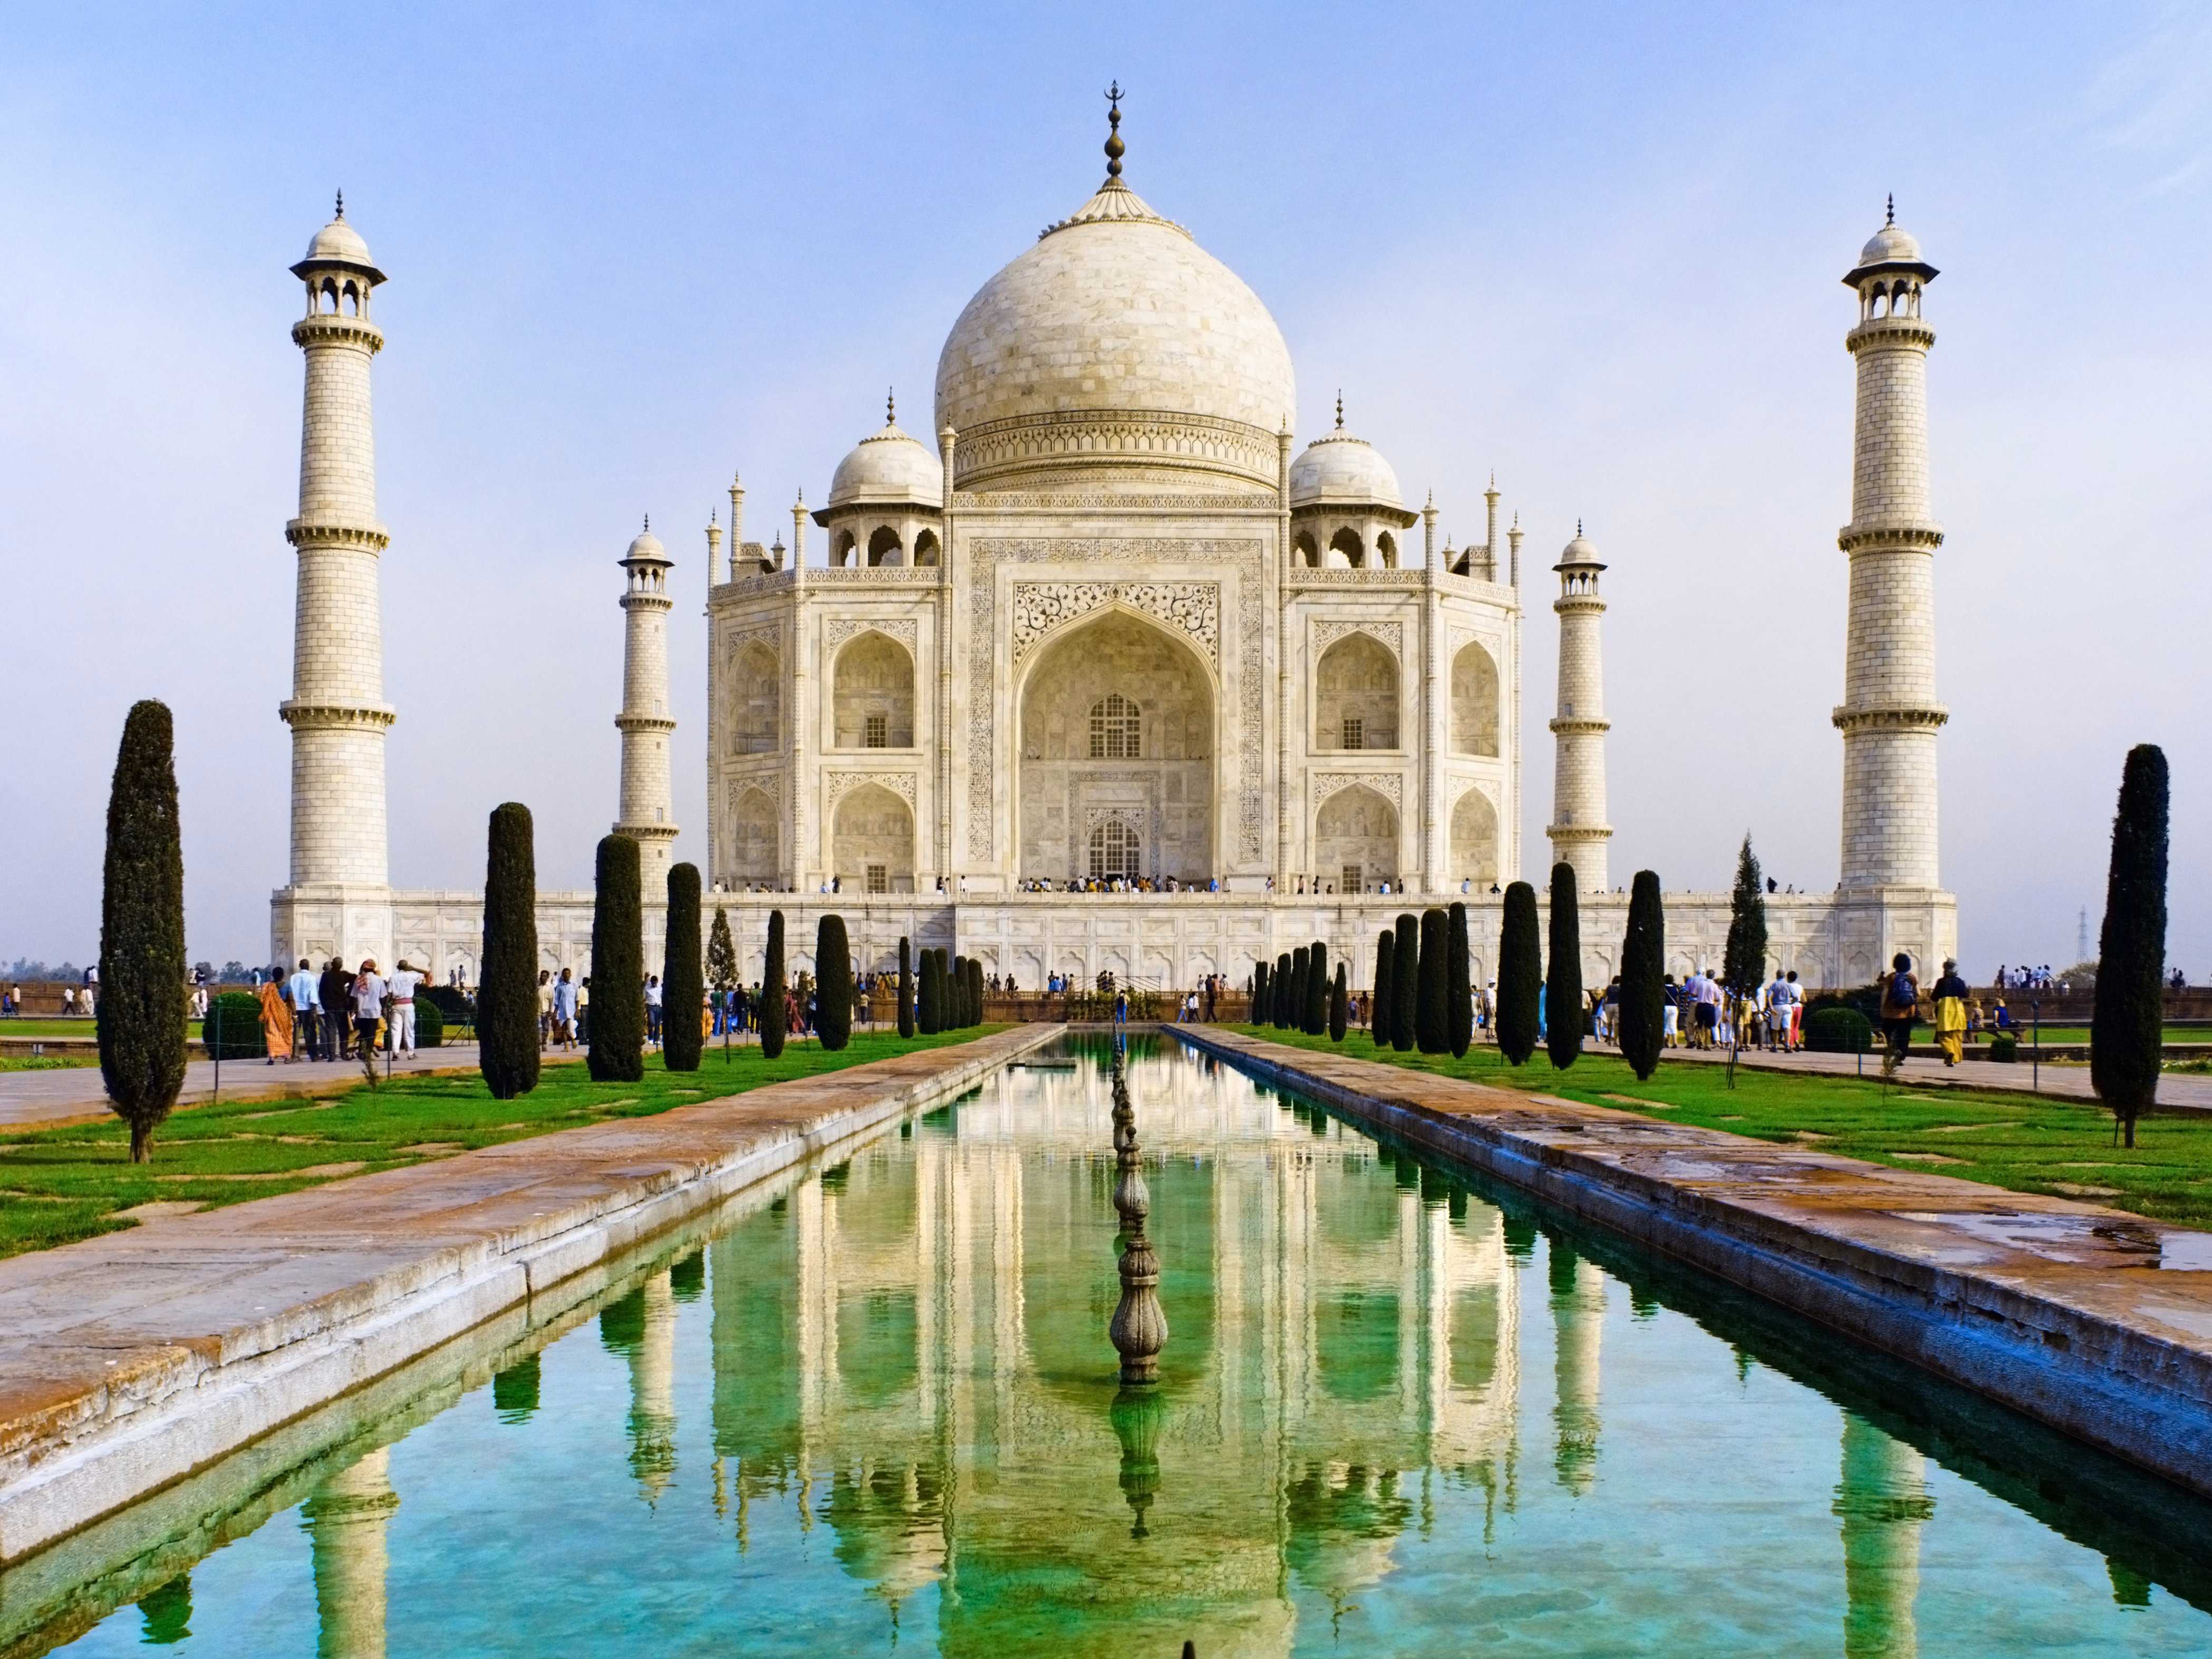 The Taj Mahal in Agra, India. (Photo: BusinessInsider.com)